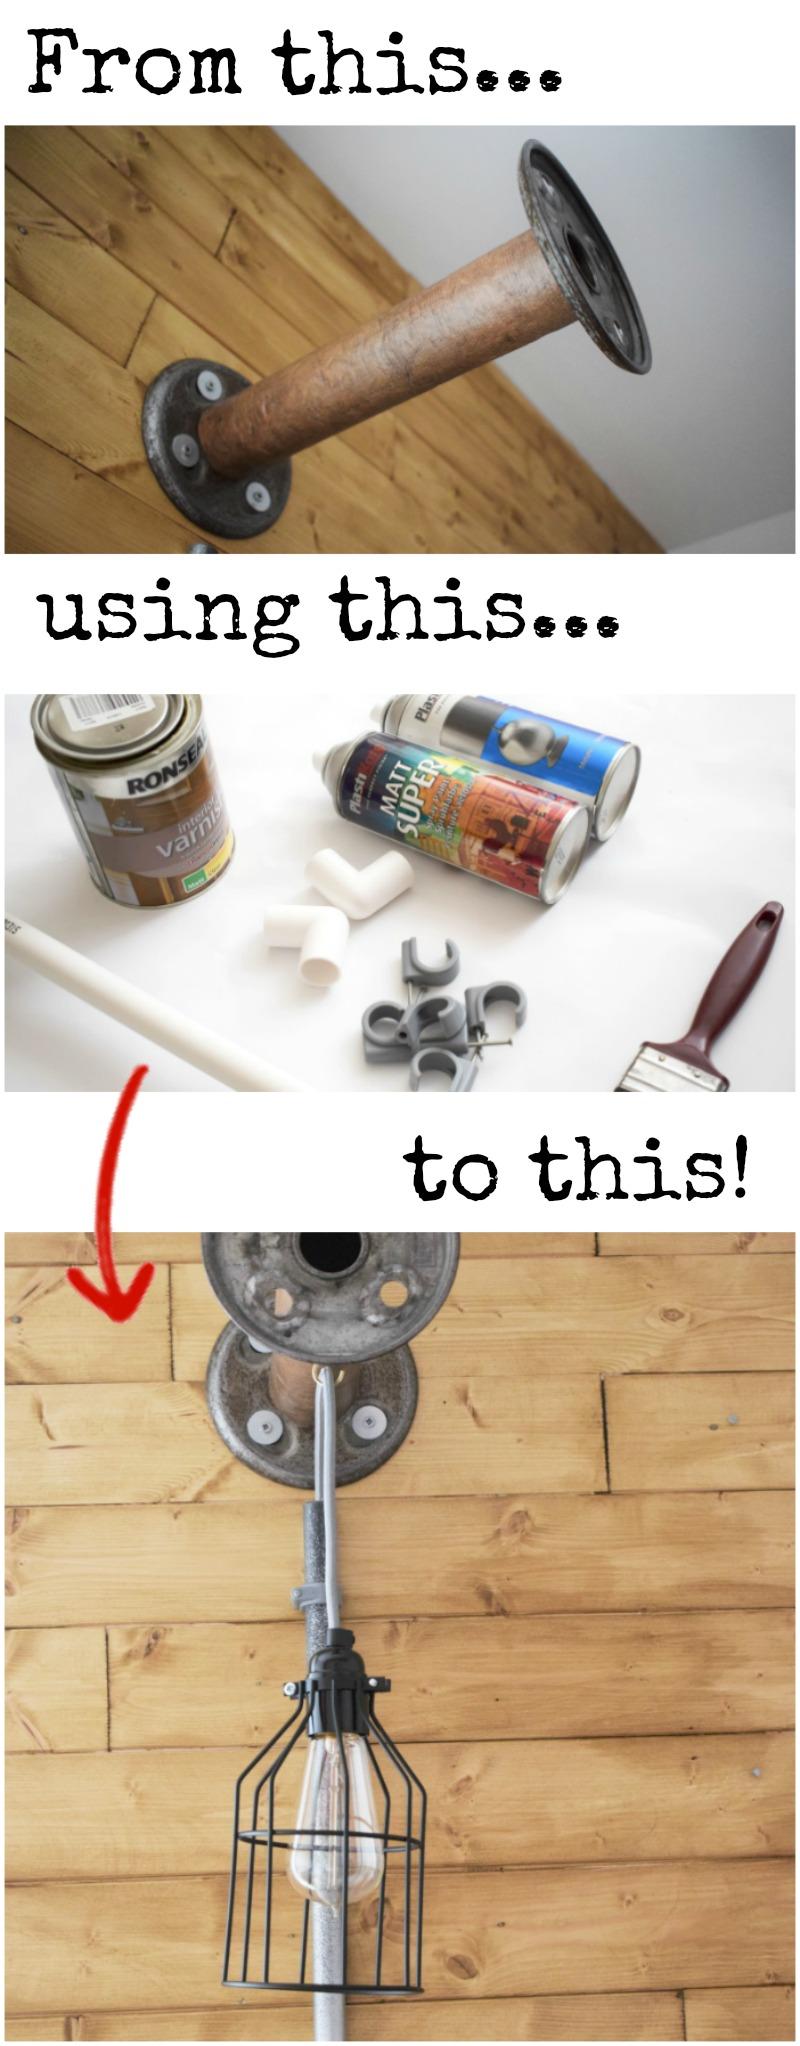 DIY INDUSTRIAL BOBBIN LIGHT HANGING pinit